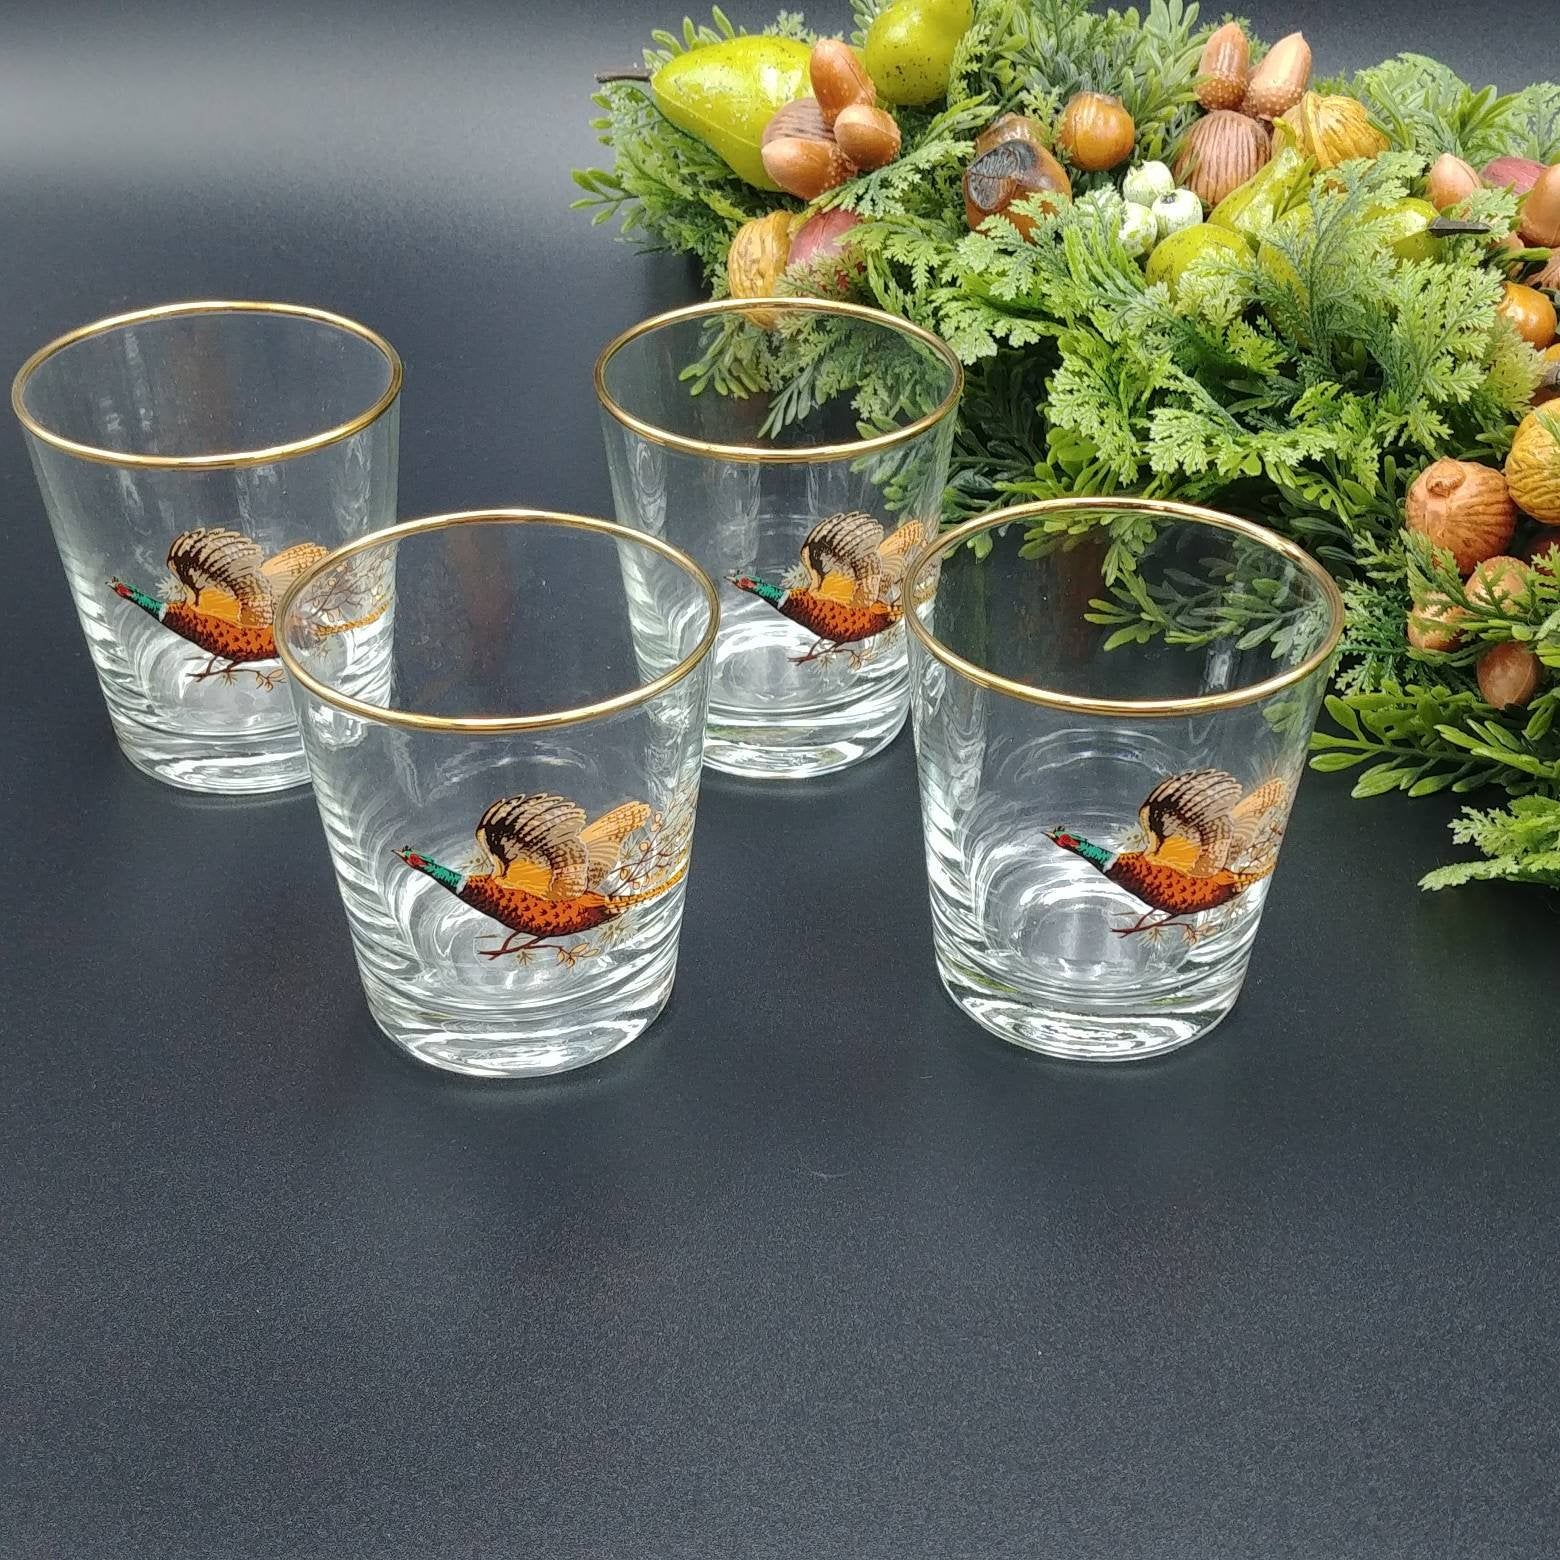 Vintage Cocktail Glasses Set of 4, Mid Century Barware